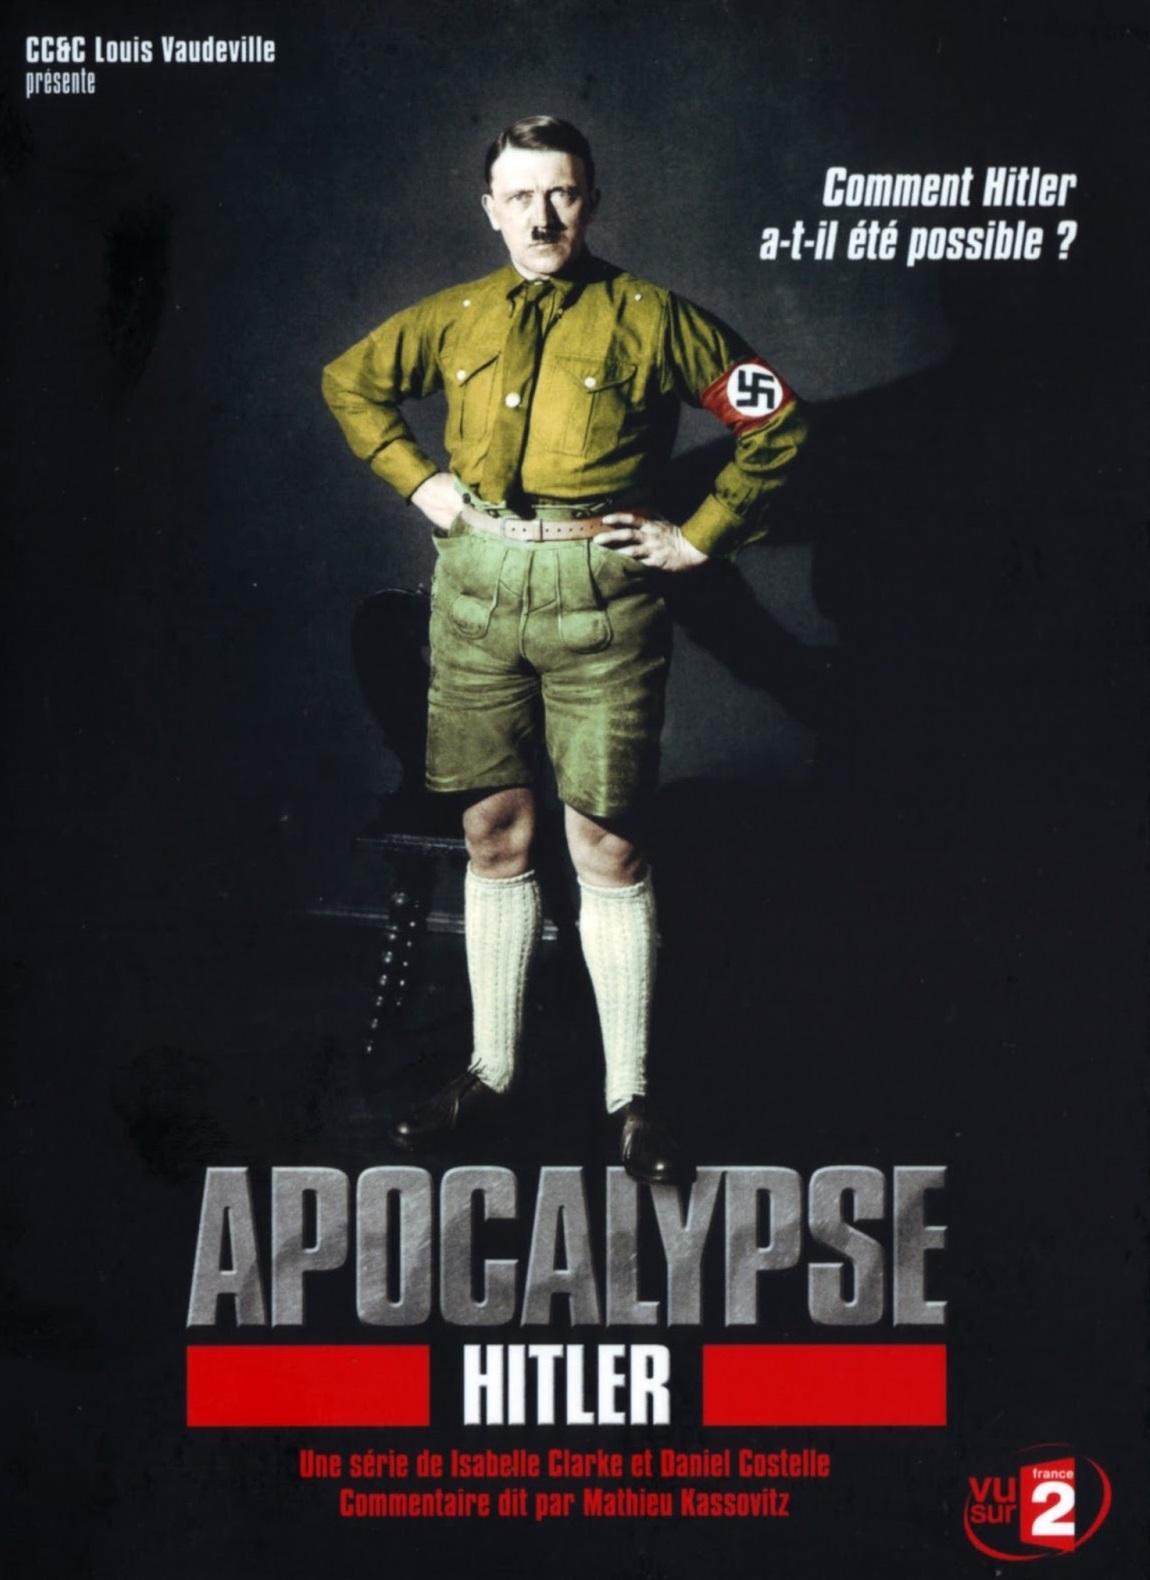 Apocalypse: The Rise of Hitler kapak